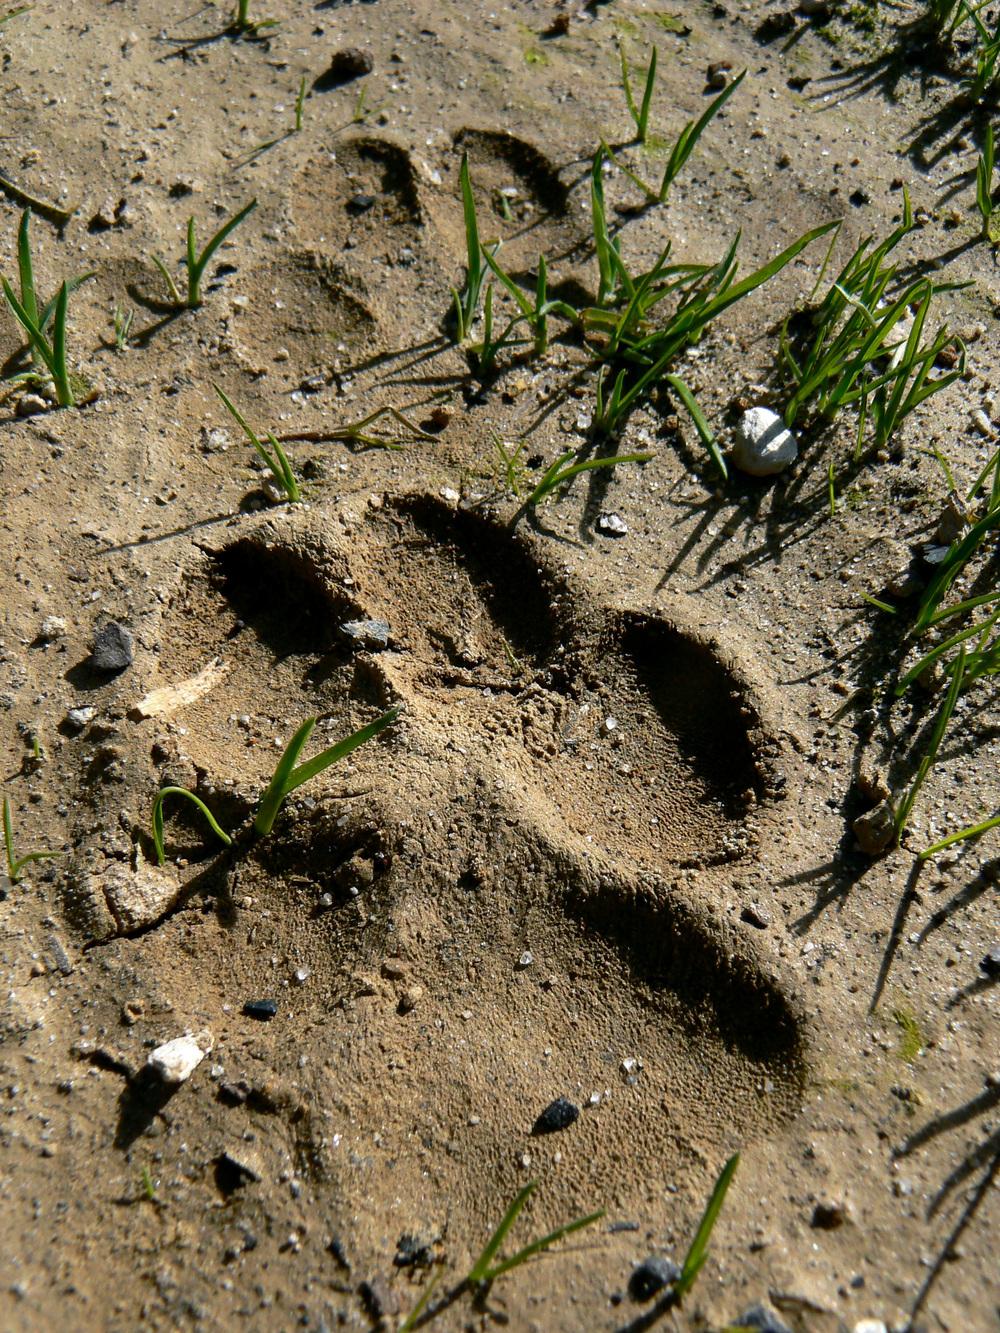 Bobcat track, Black Diamond Mines Regional Preserve.